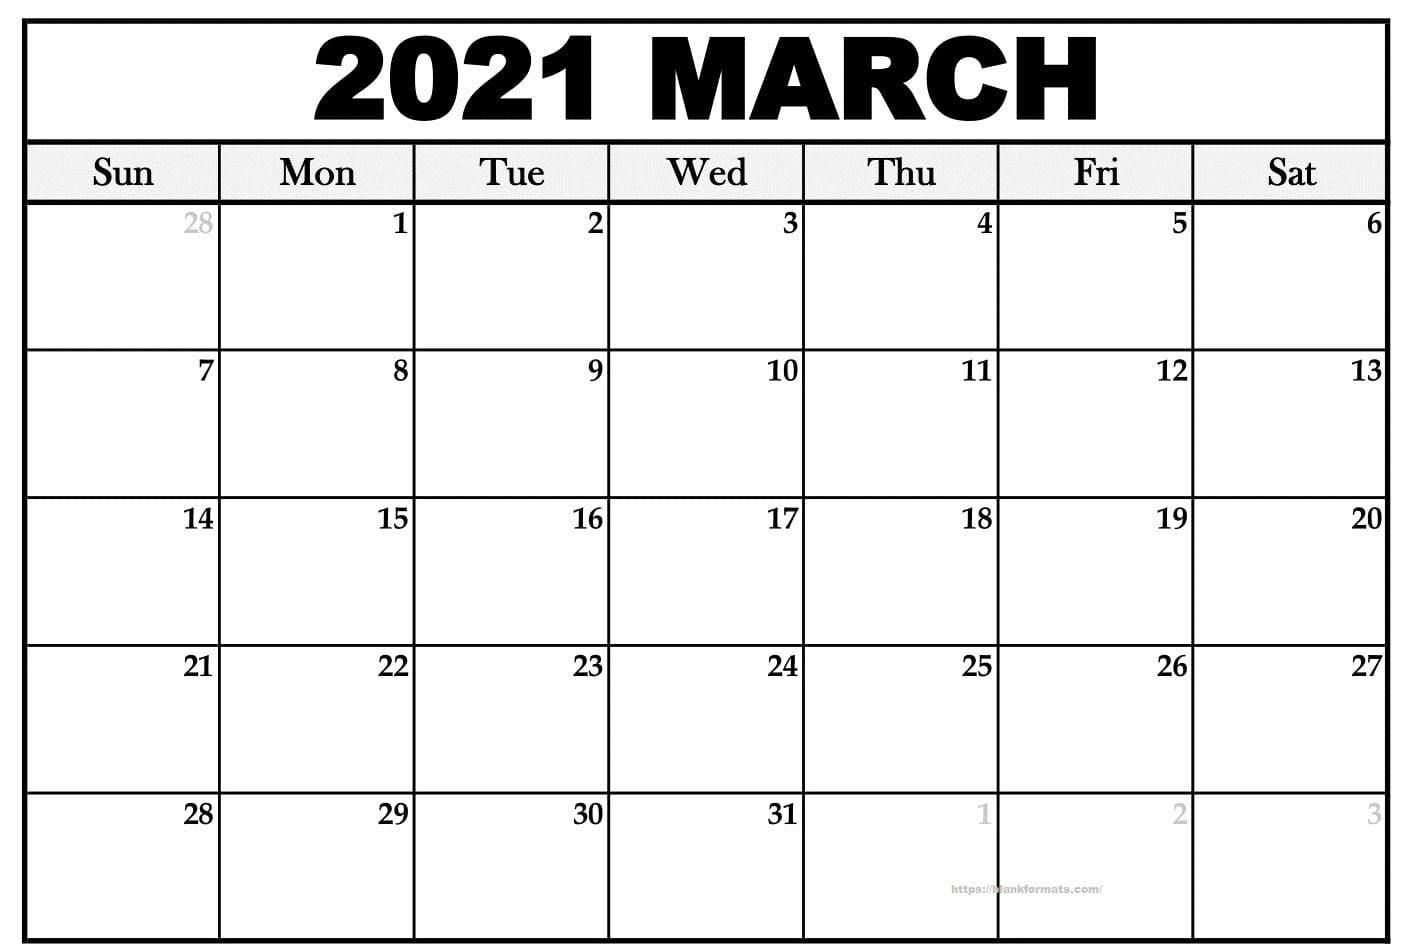 Printable March 2021 Calendar - Pdf, Word, Excel Sheet  Printable March 2021 Calendar Pdf